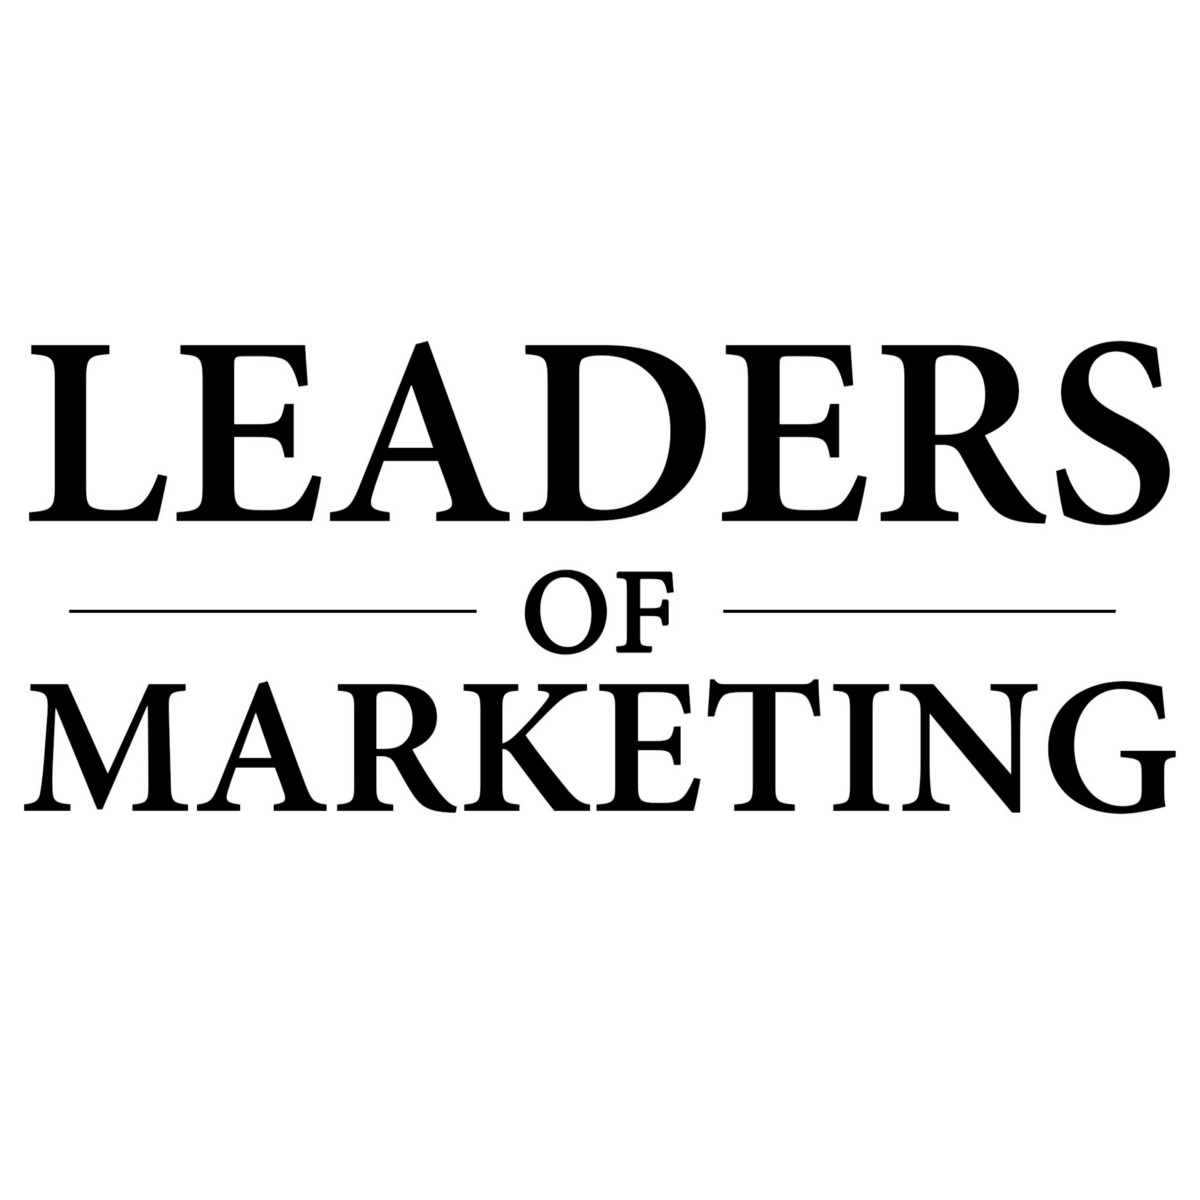 Leaders Of Marketing